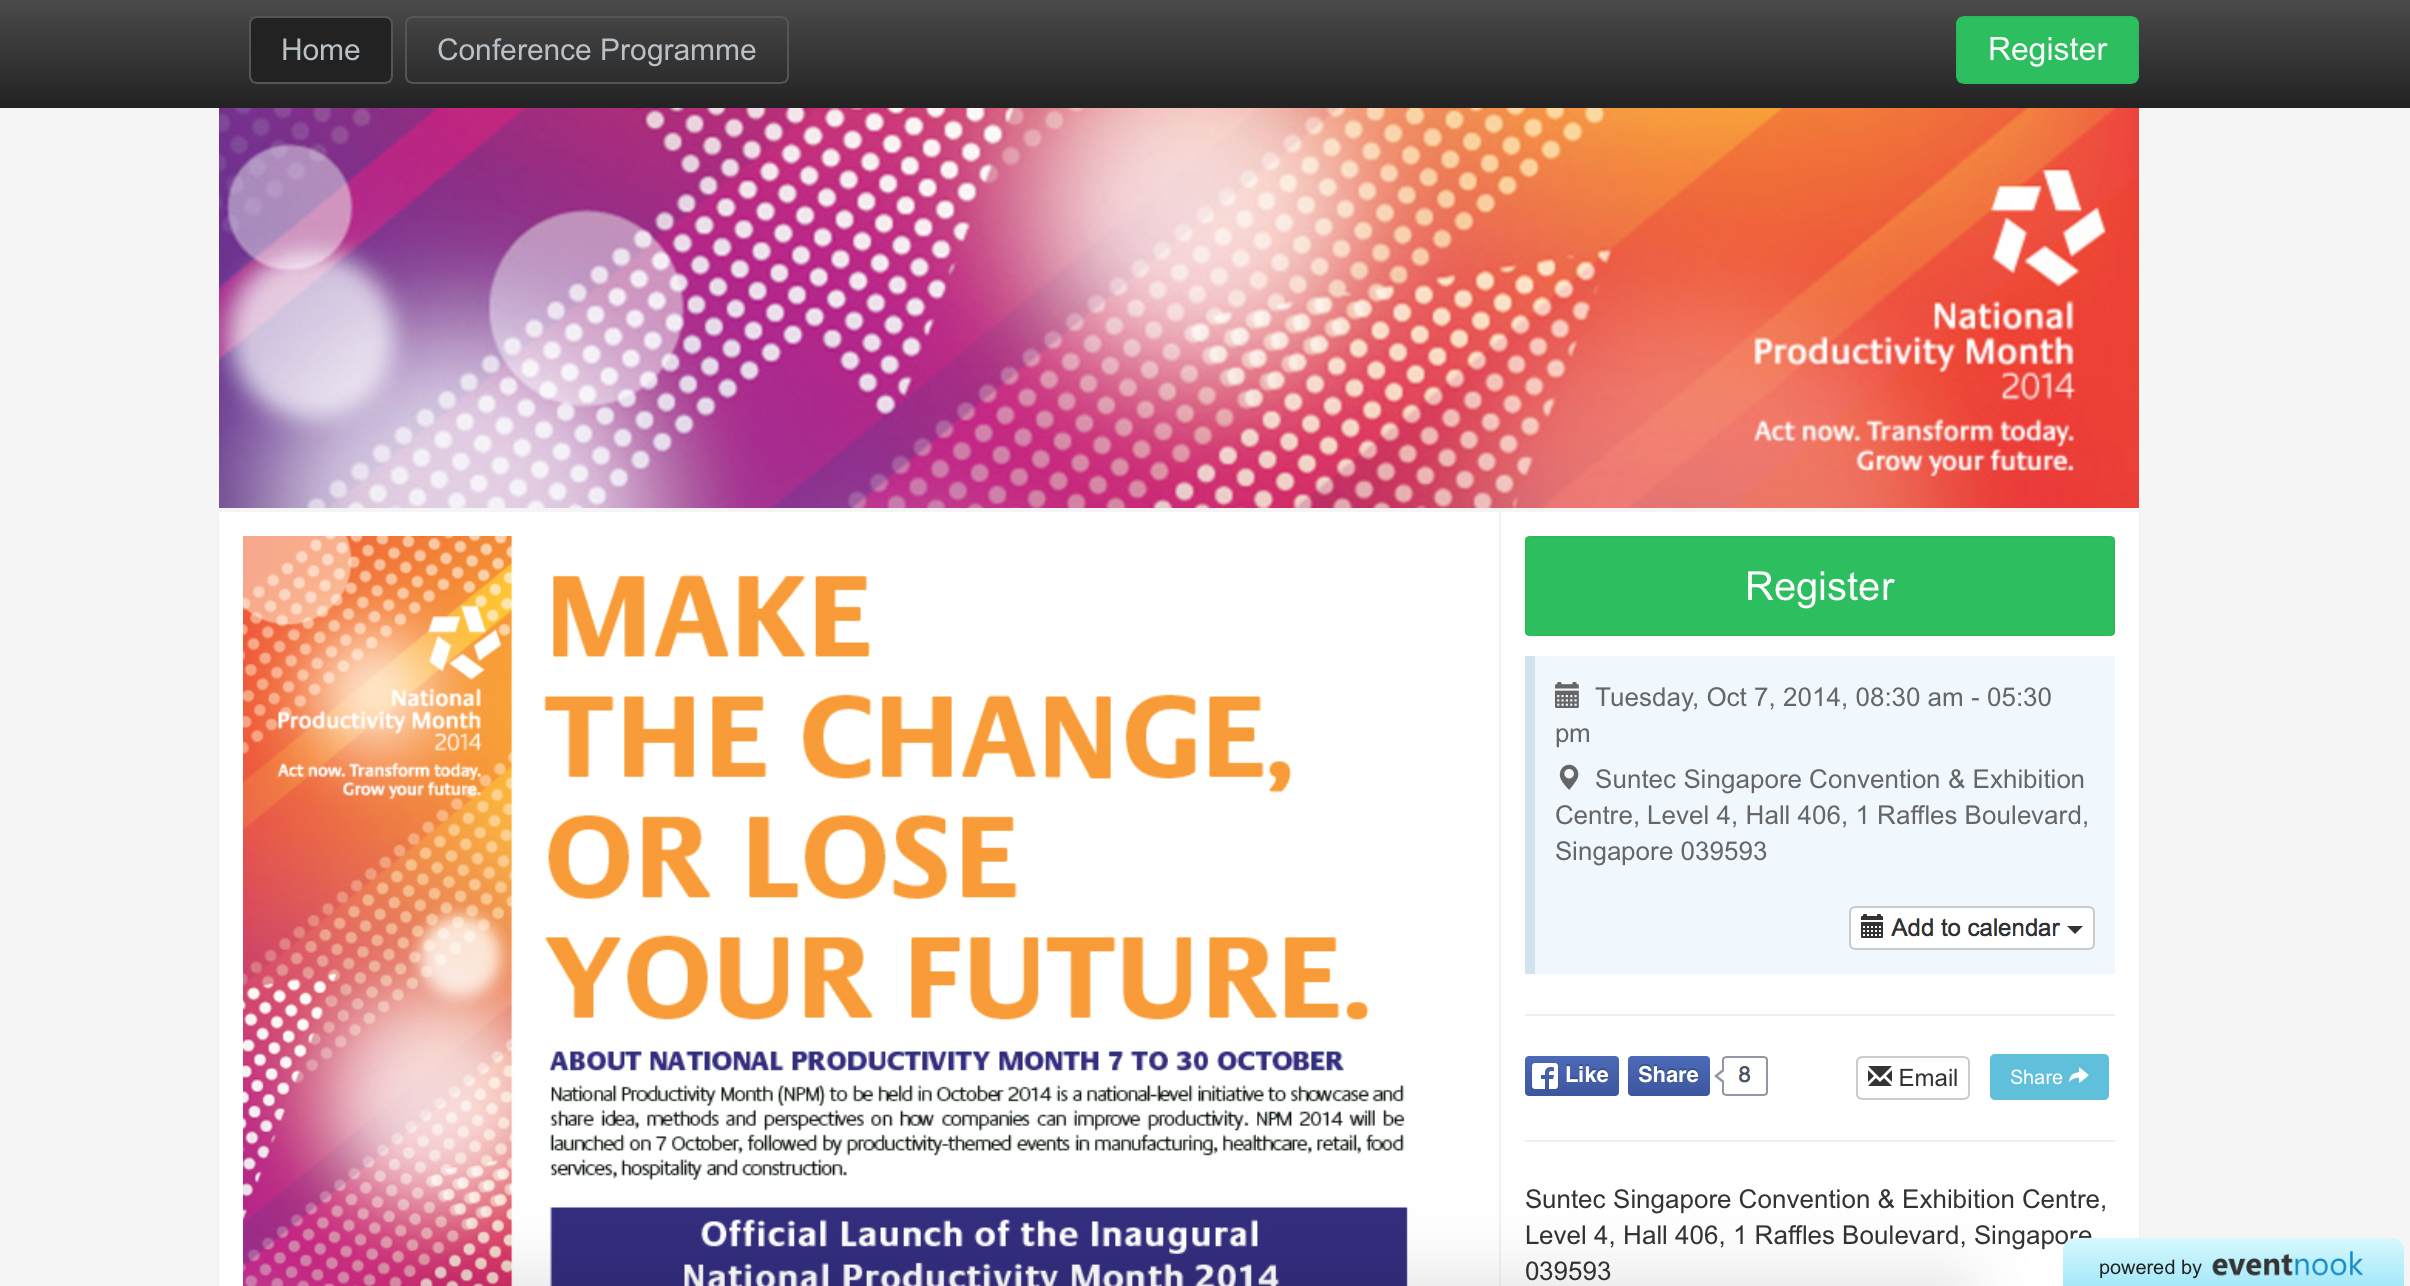 EventNook event registration site - Singapore National Productivity Month 2014